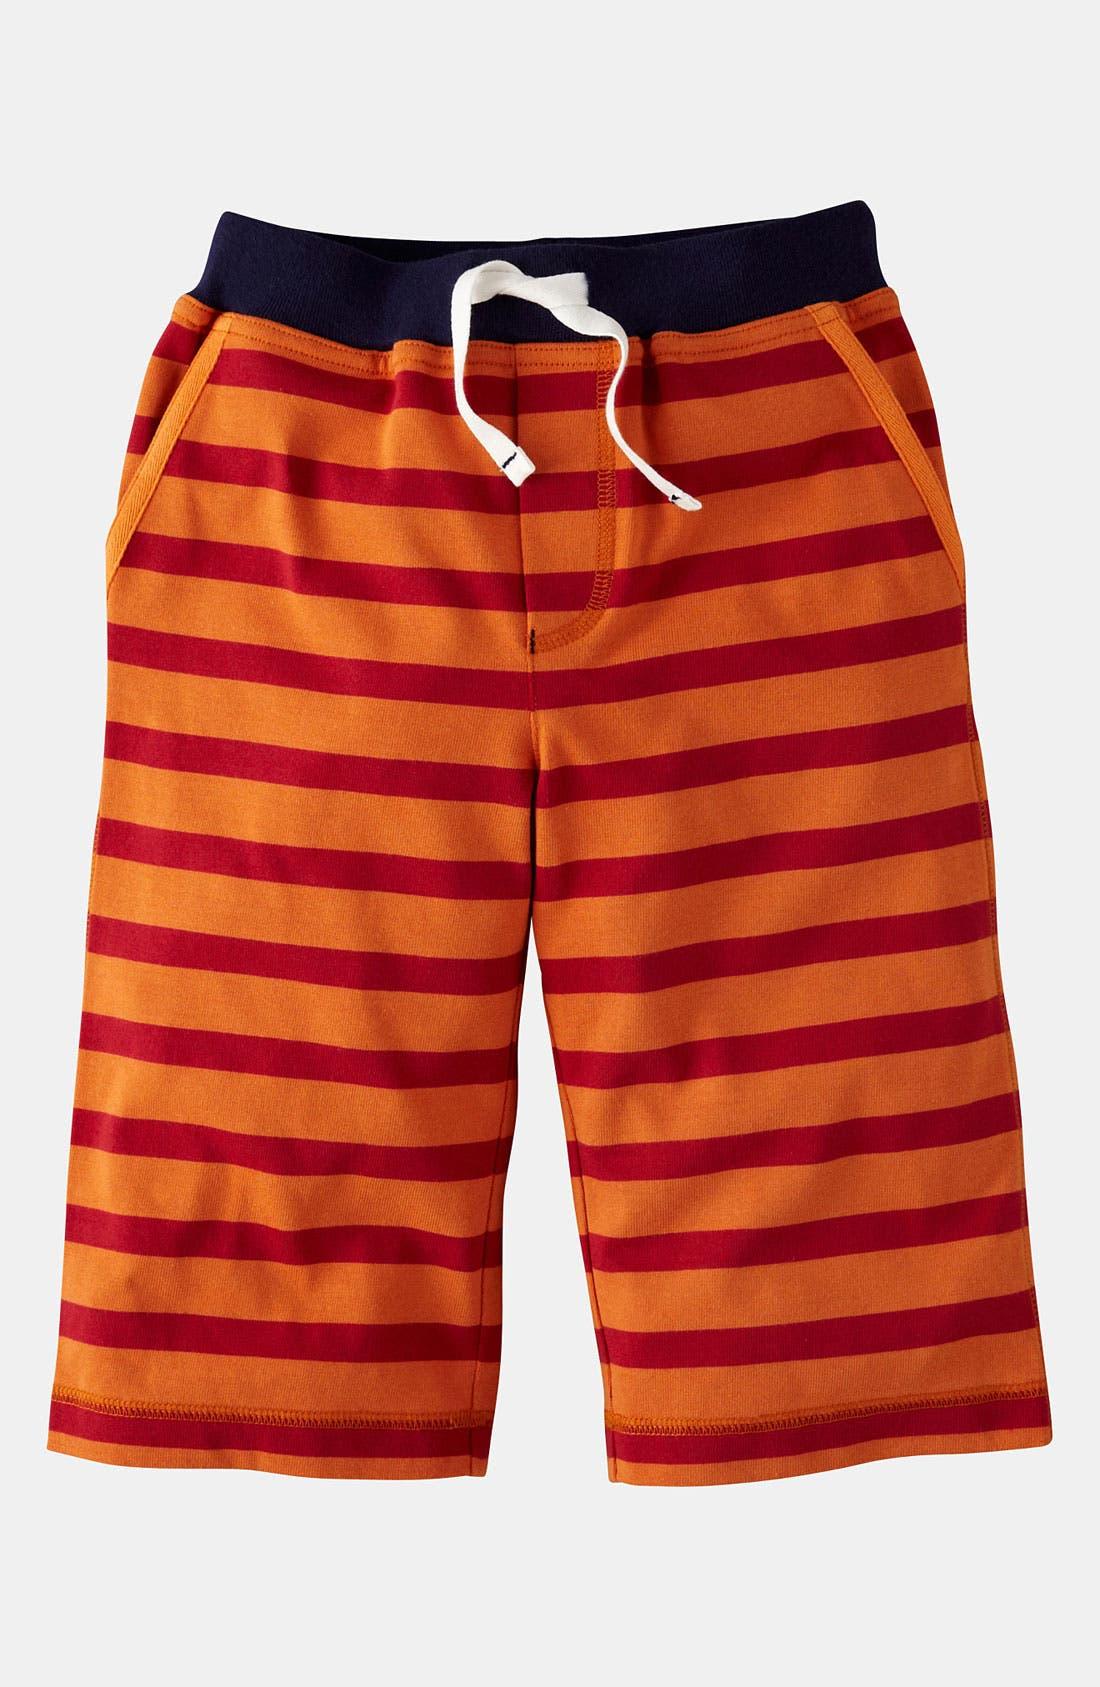 Alternate Image 1 Selected - Mini Boden Stripe Shorts (Toddler, Little Boys & Big Boys)